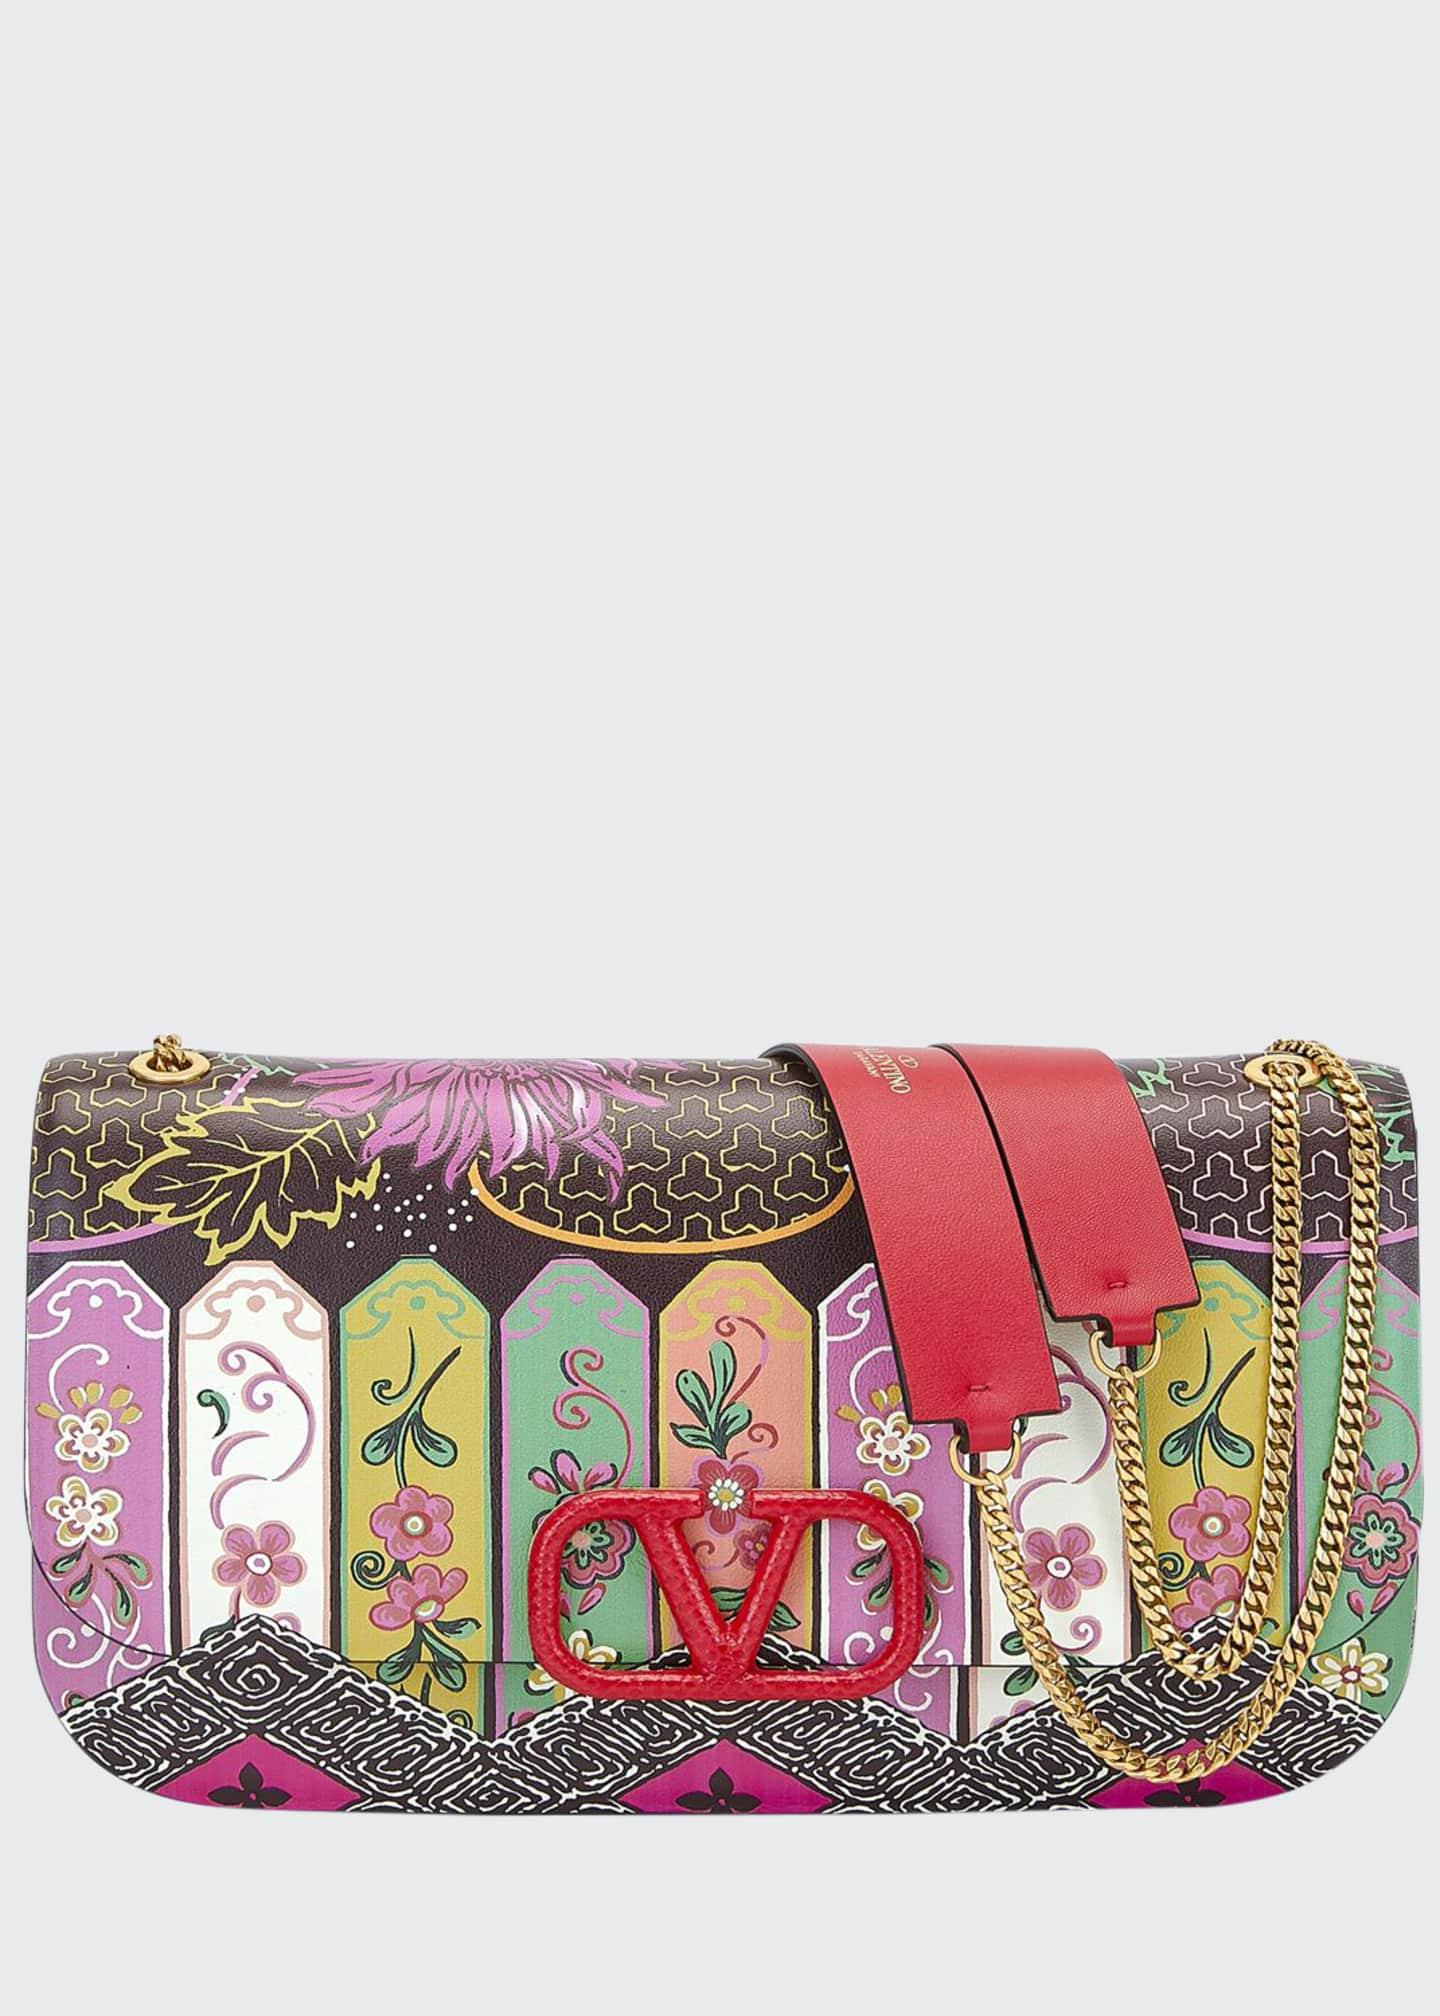 Valentino Garavani VLOCK Flower Shoulder Bag with Snakeskin